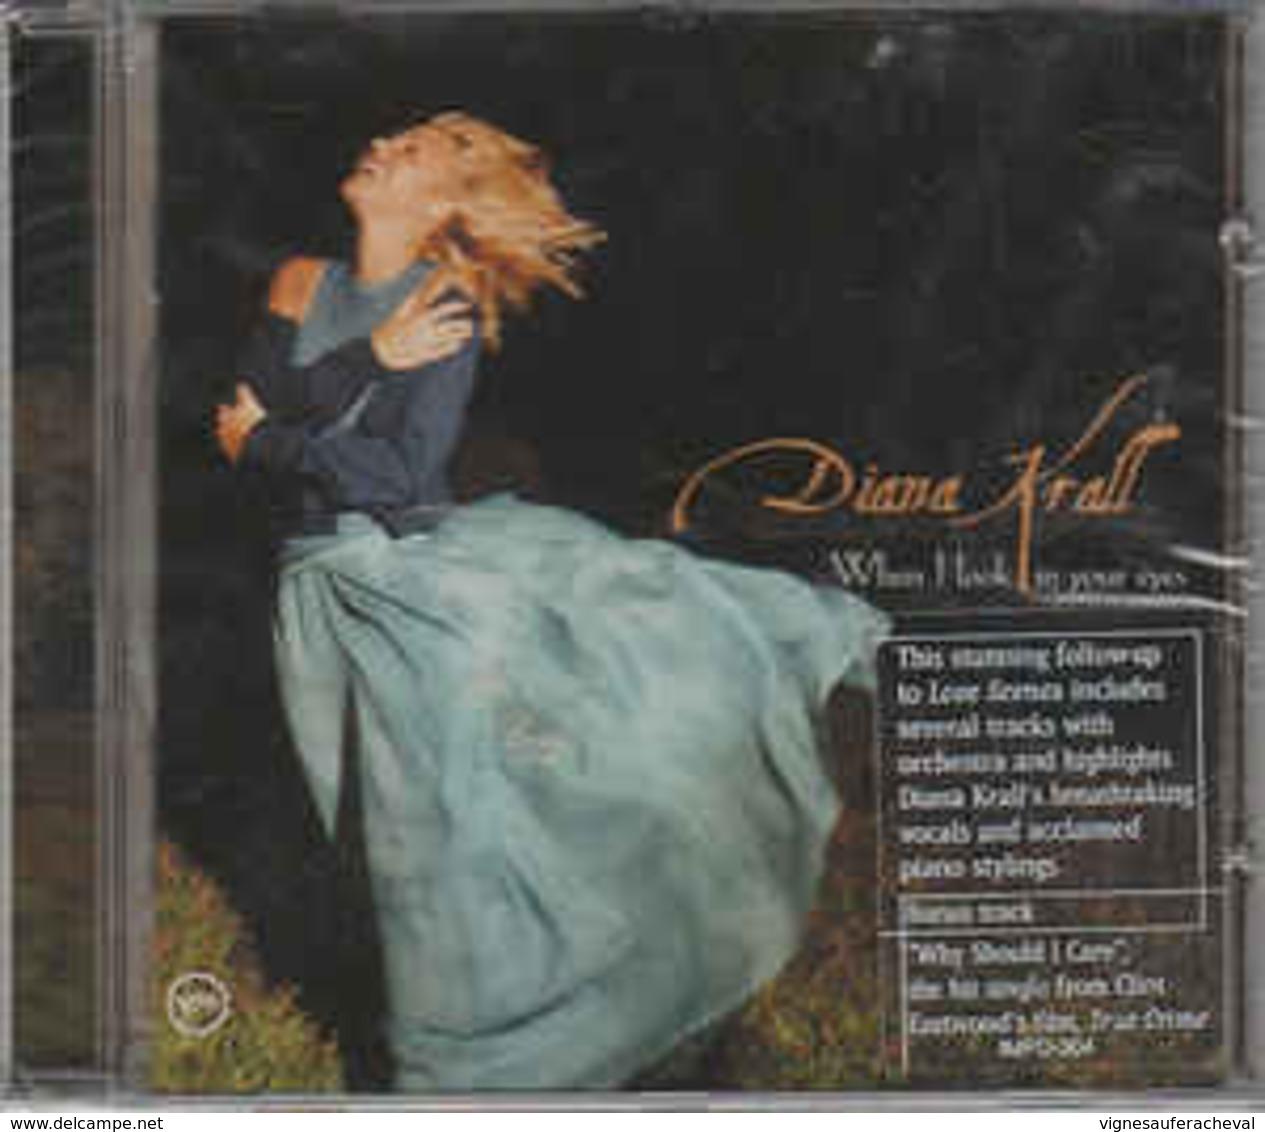 Diana Krall-When I Look In Your Eyes - Jazz